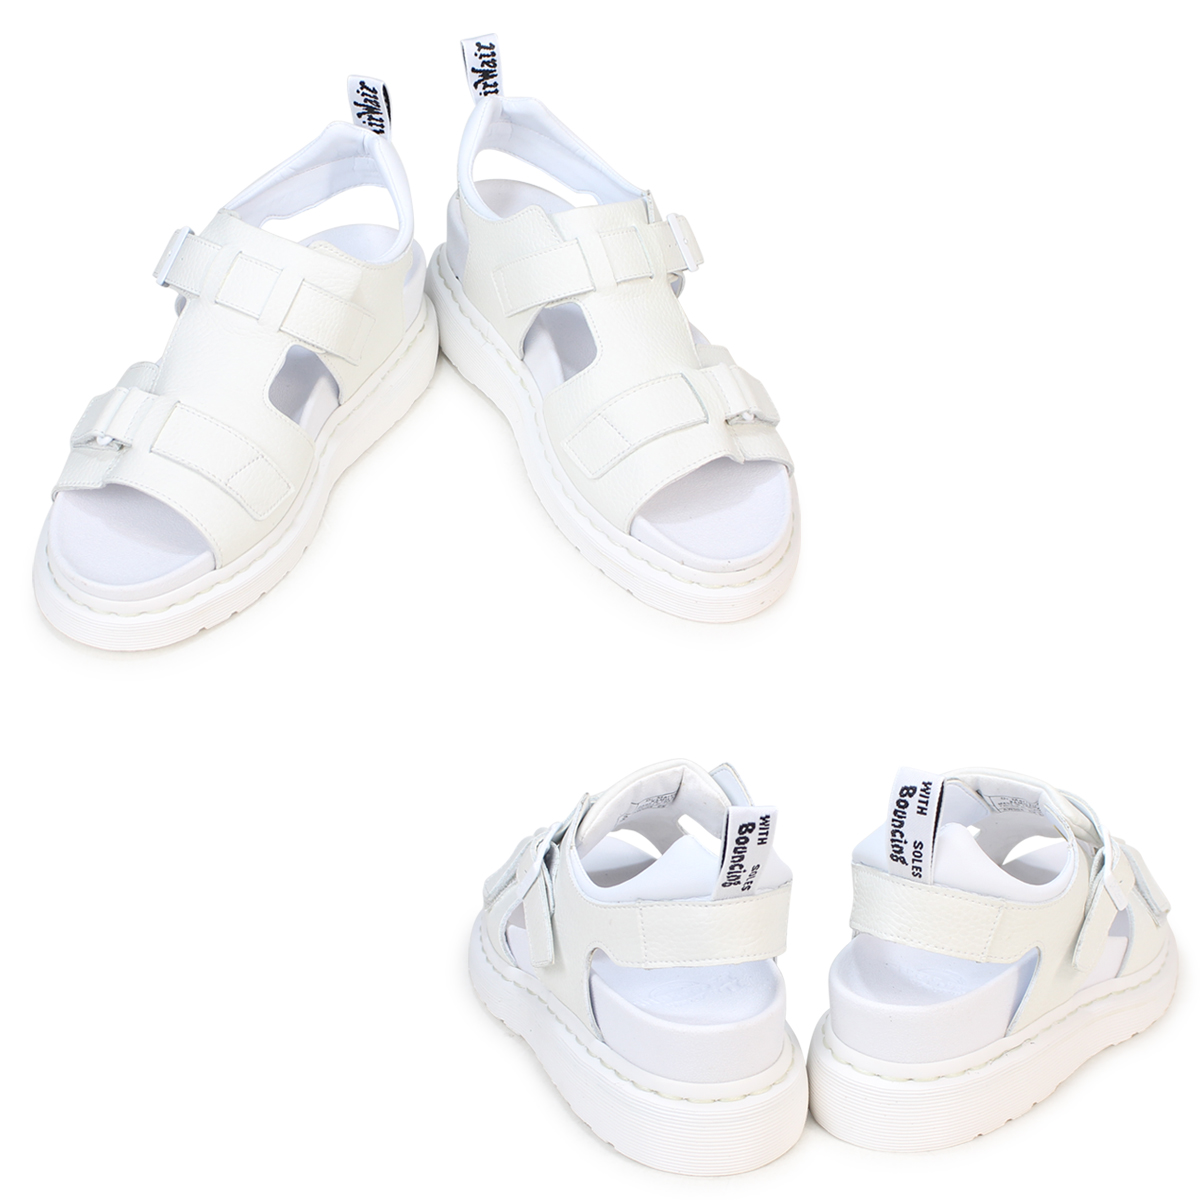 博士马丁凉鞋女士人Dr.Martens皮革SHORE KAMILAH 2 STRAP SANDAL 21895100白[3/29新进货]